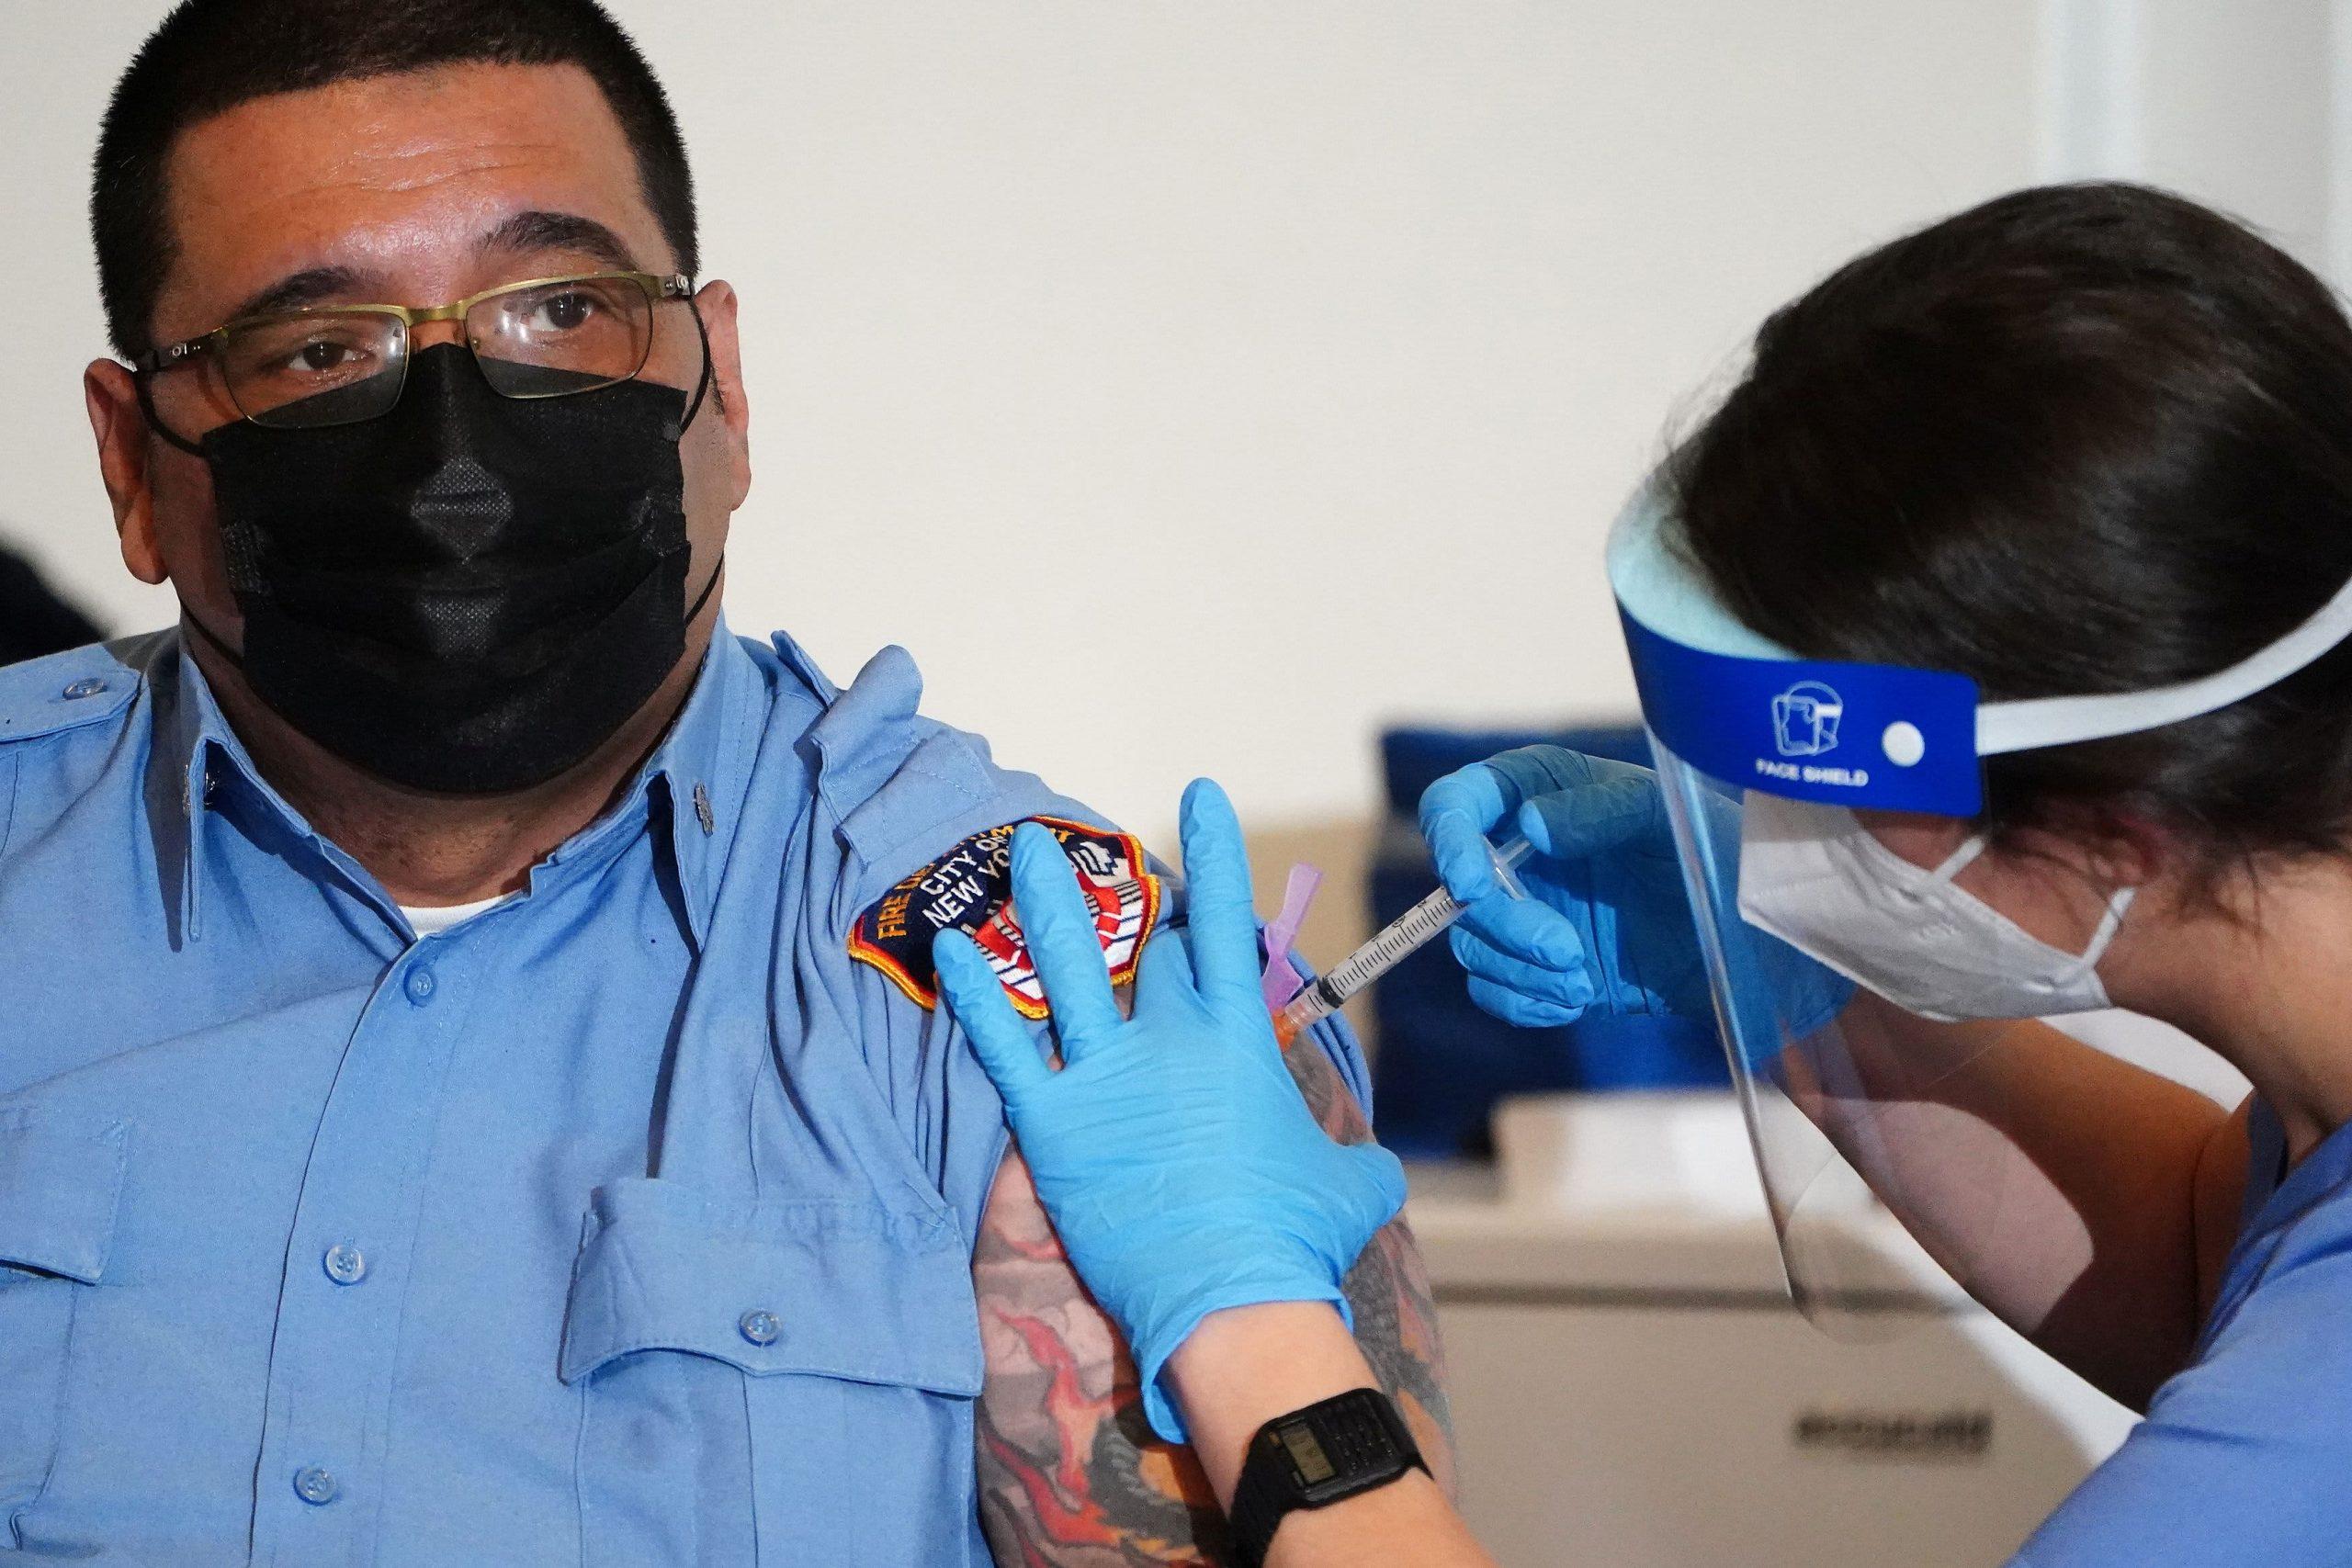 new-york-mayor-de-blasio-wants-to-immunize-1-million-residents-in-january